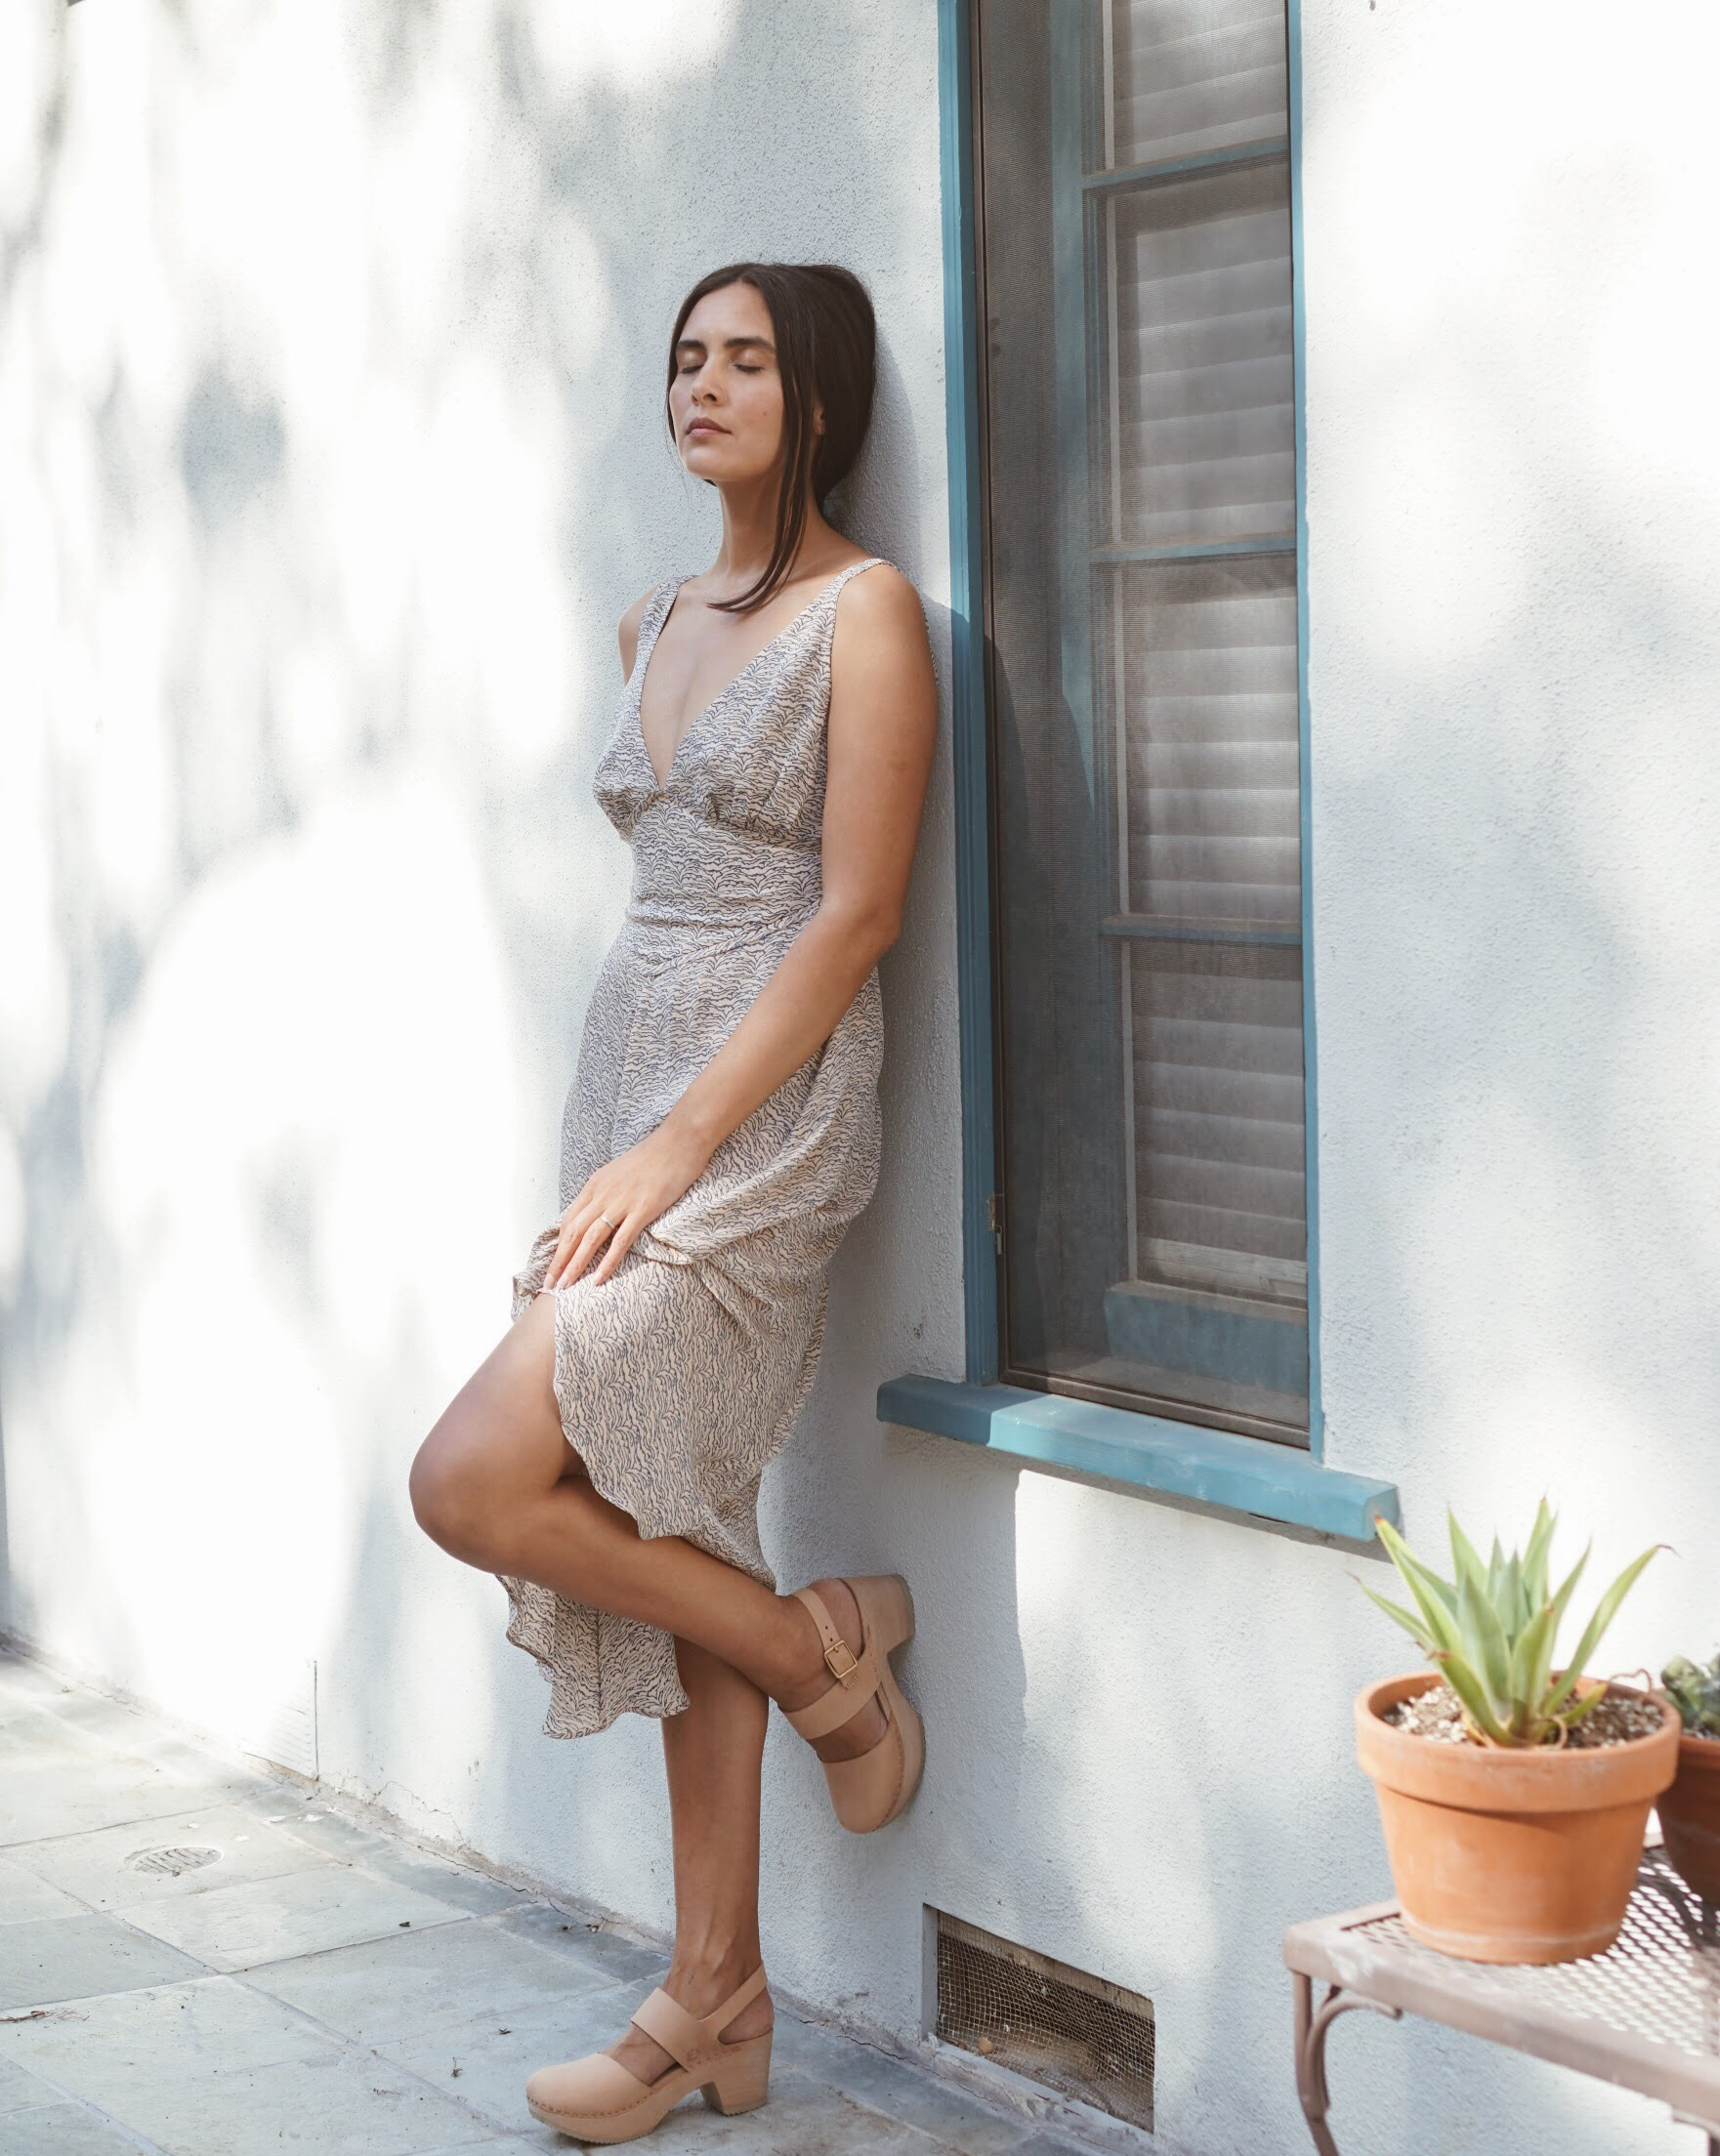 Olga Kapustina Silk Georgette Slip dress in Print +   Zuzii   Closed Toe Clogs in Natural.